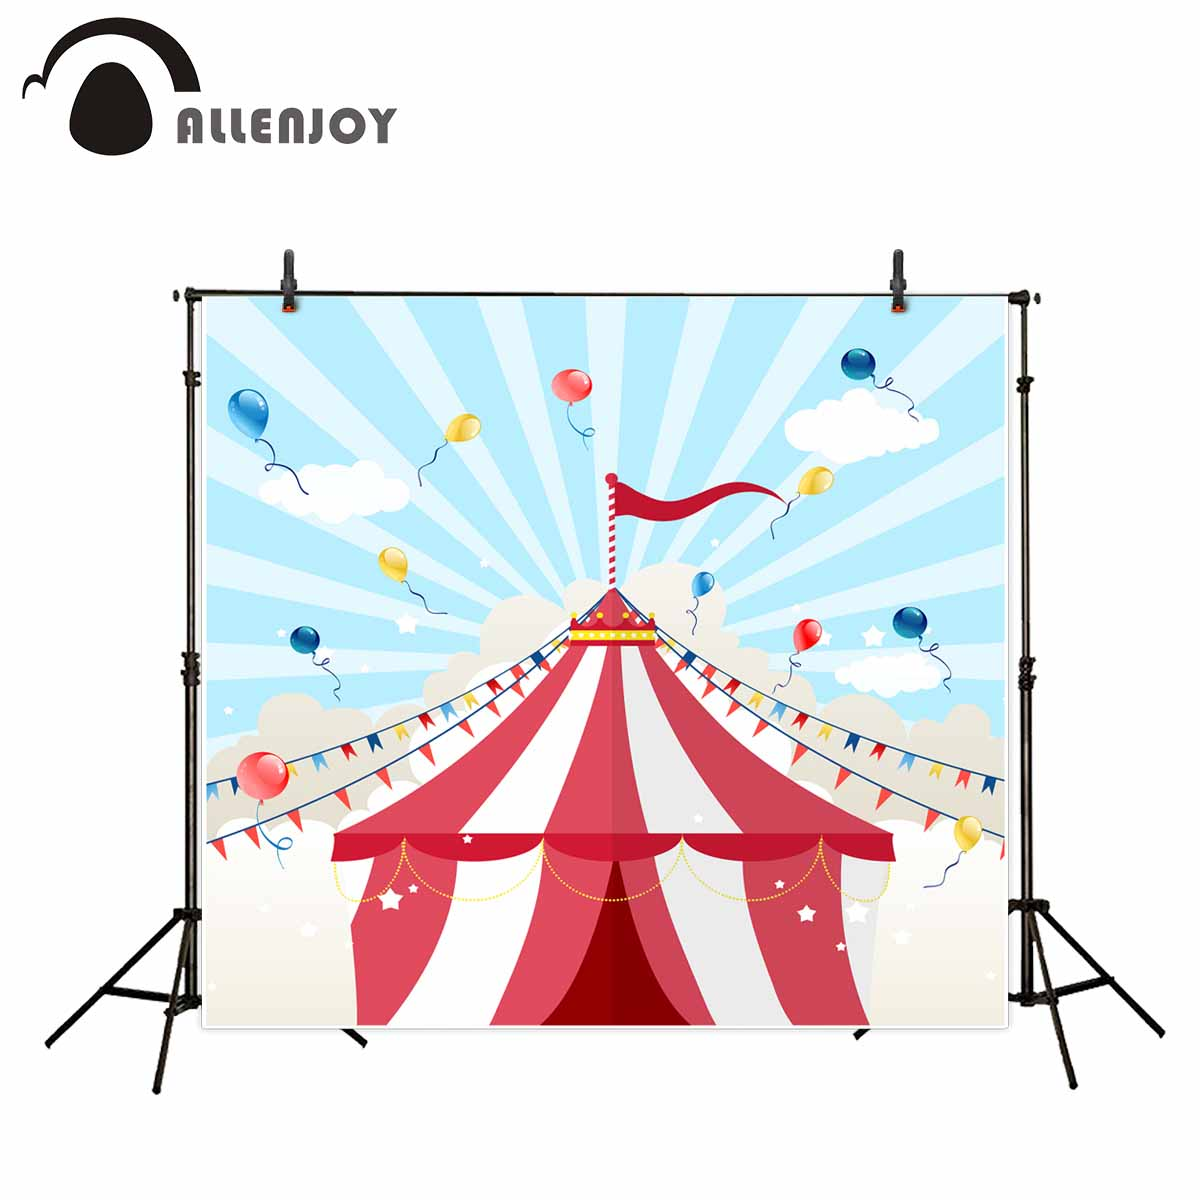 Allenjoy photography background cartoon circus tent colorful balloon flags backdrop photography studio camera fotografica 5feet 6 5feet background snow housing balloon photography backdropsvinyl photography backdrop 3447 lk